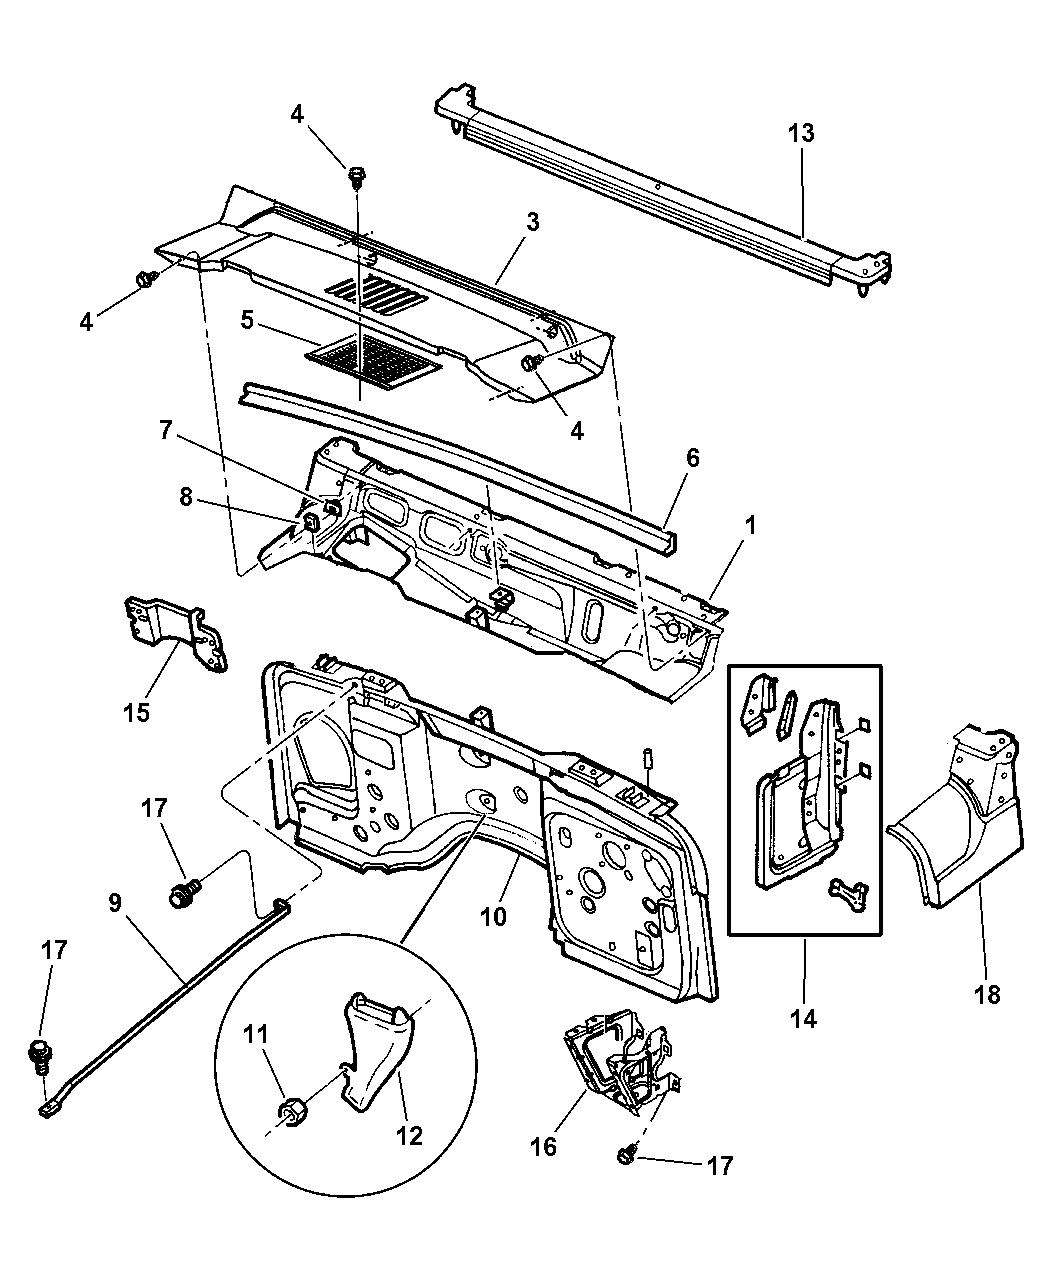 2002 jeep wrangler engine diagram oil 2002 jeep wrangler dash diagram